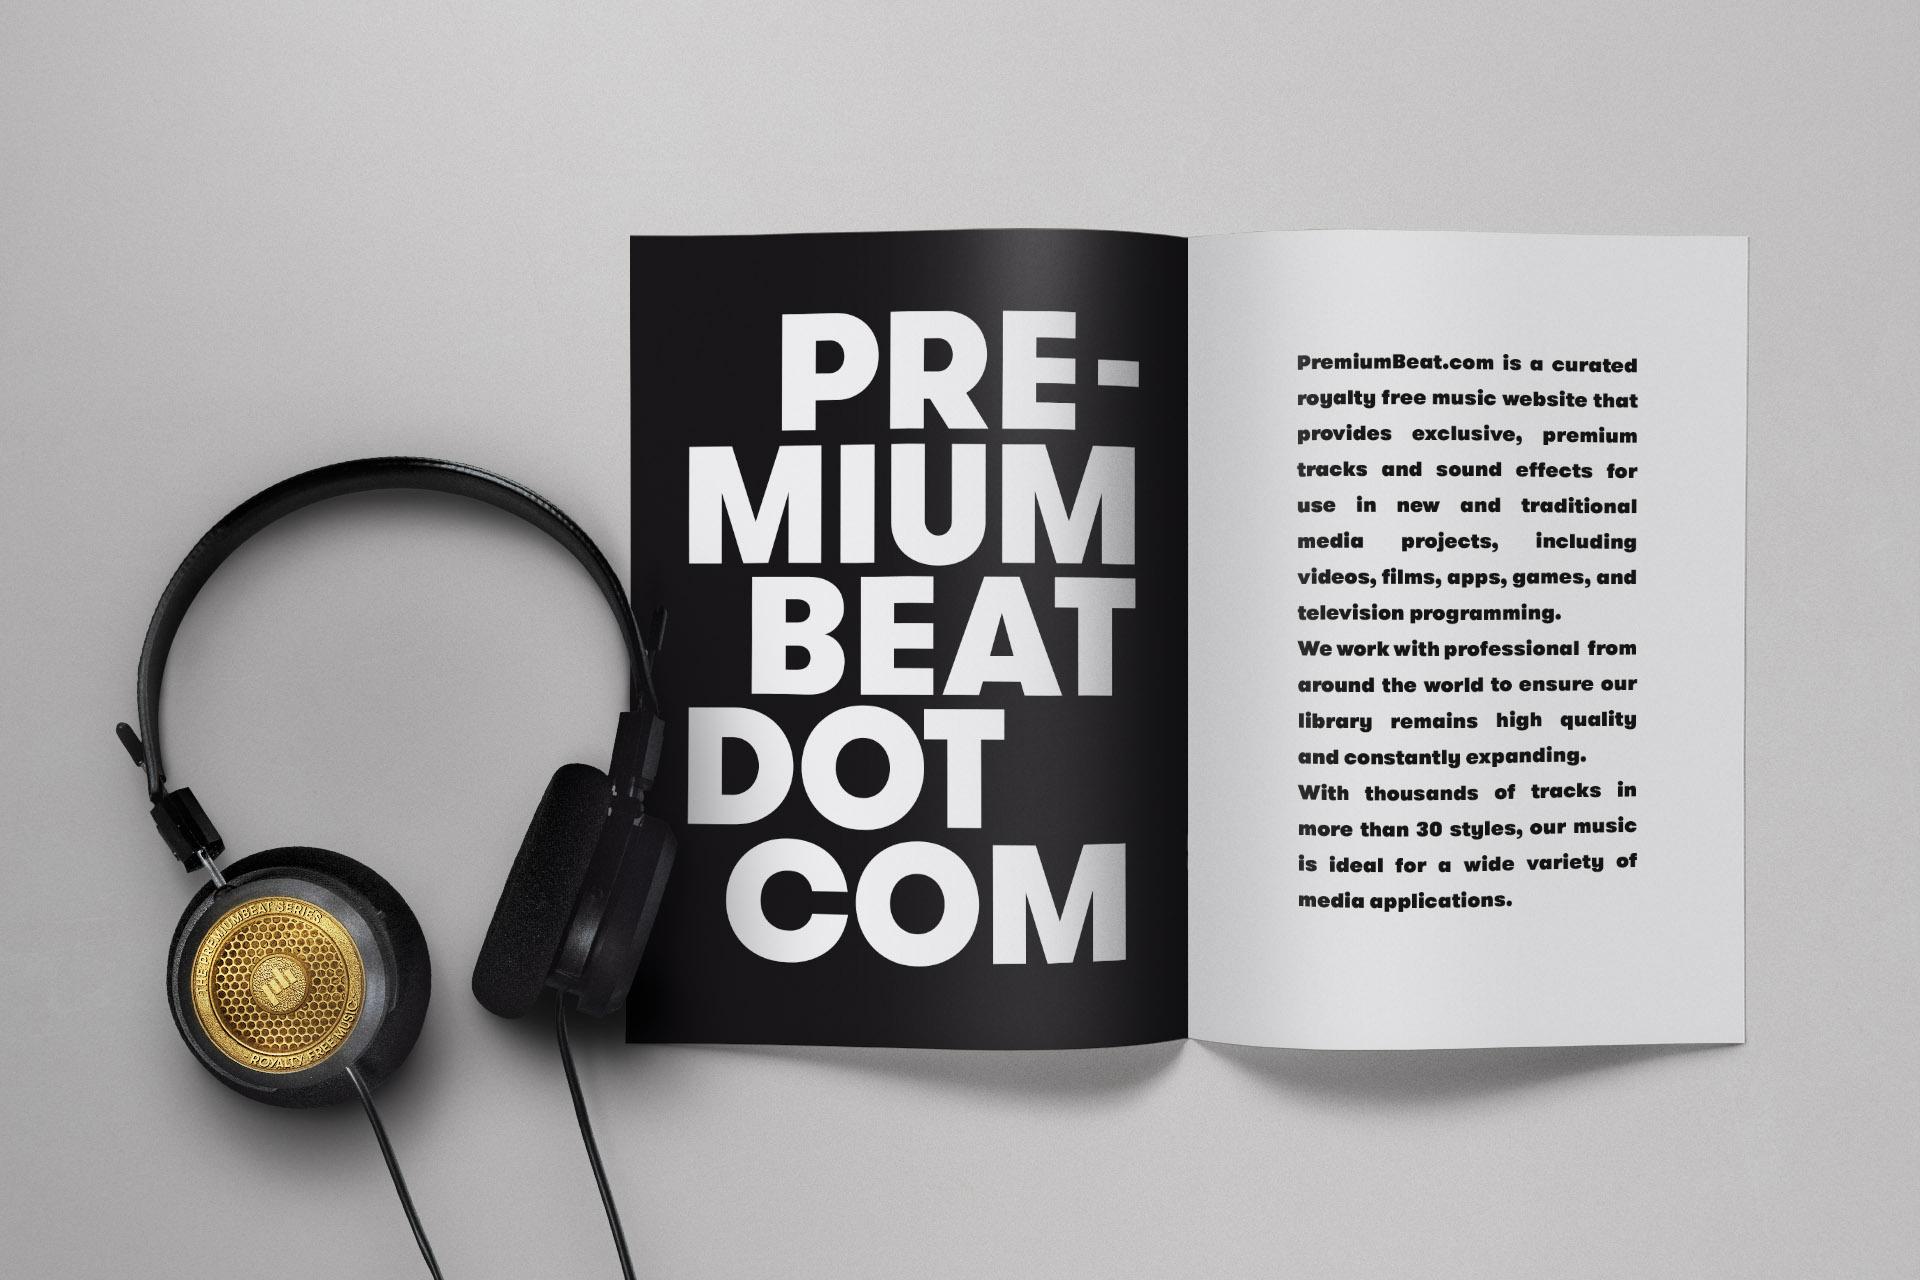 pb-brand-magSpread-premiumDotCom3